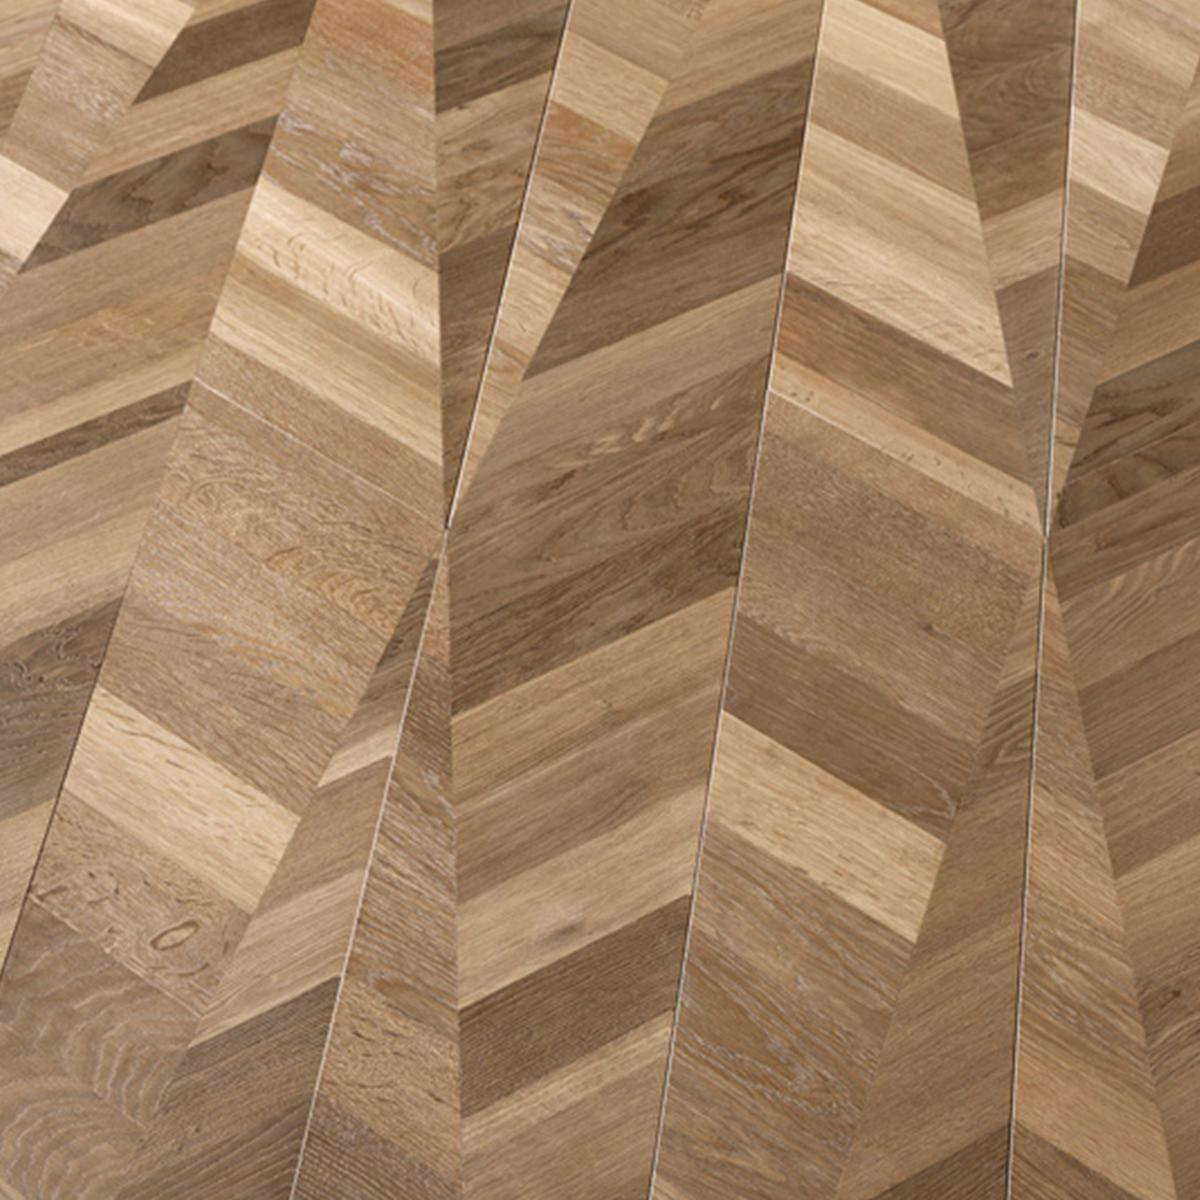 Miraggi Ca Corner Wood Finish Pinterest Floor Patterns Floor